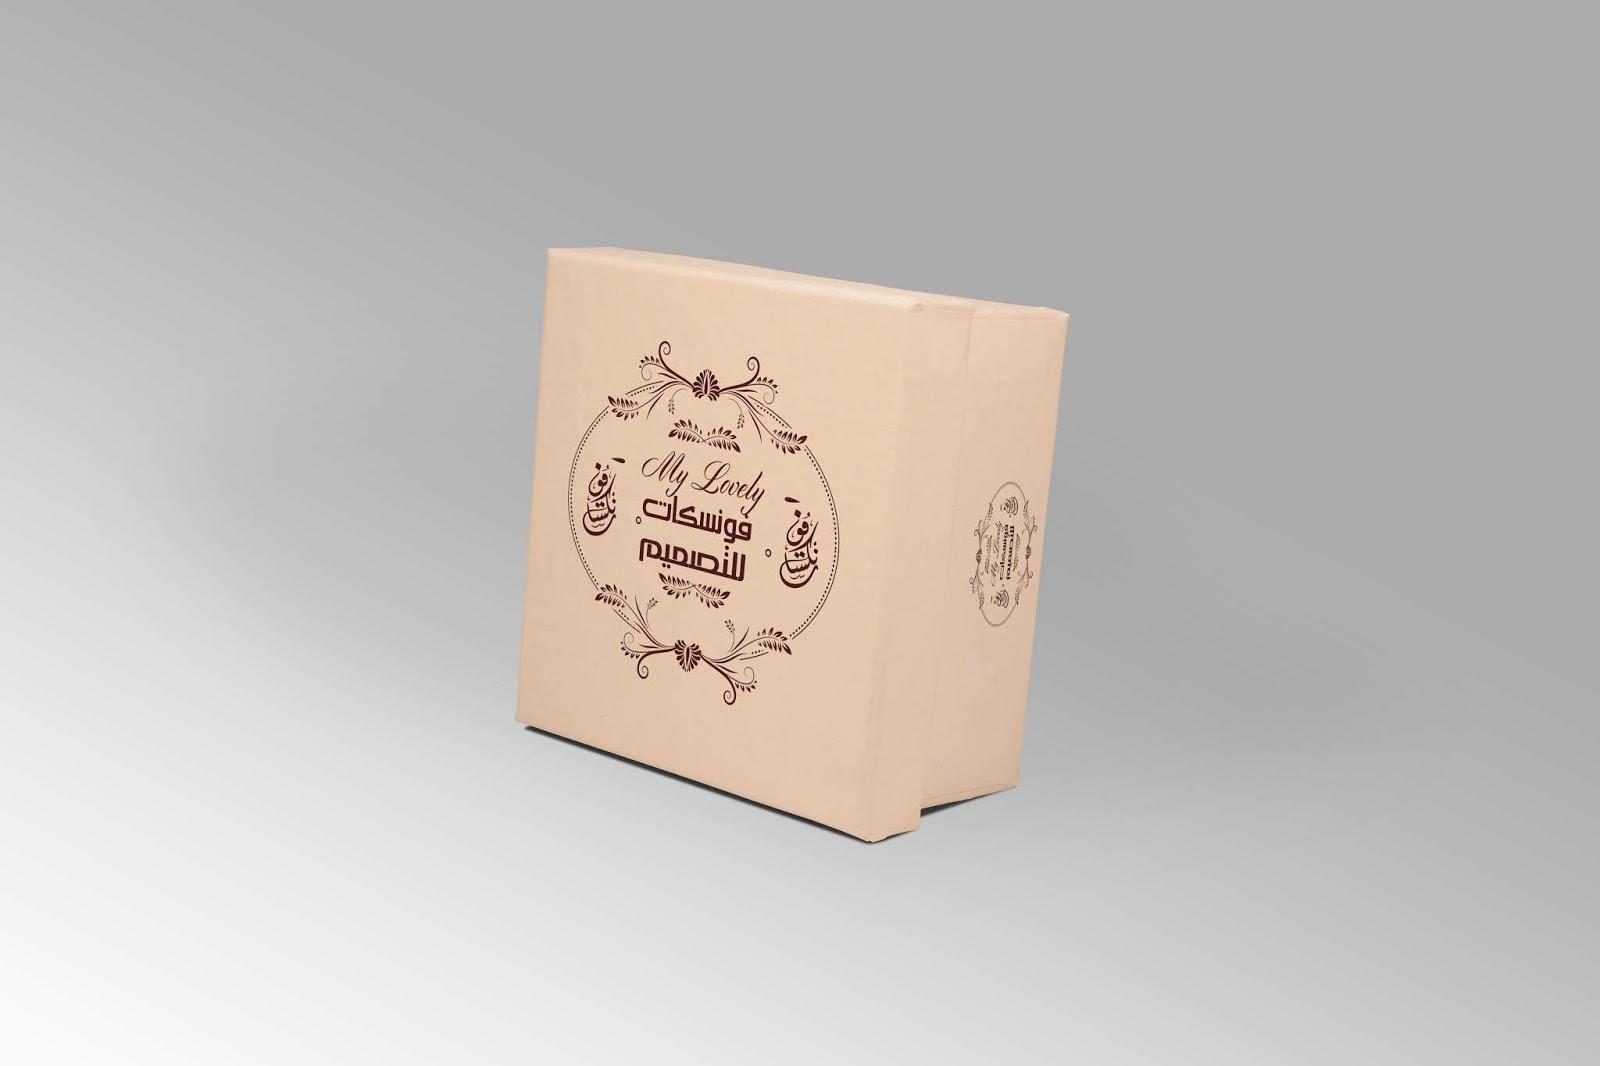 Mockup Medium Brown Square Gift Boxes